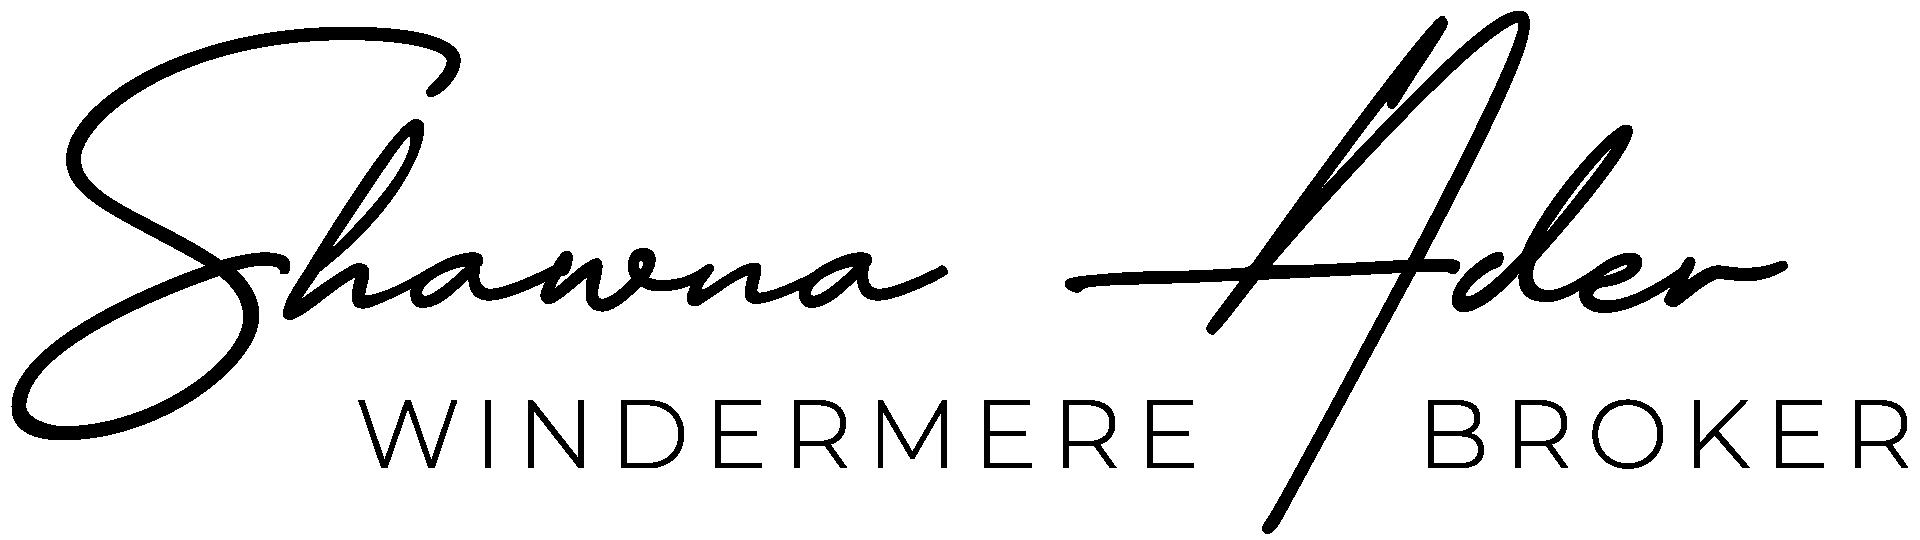 Shawna Ader logo